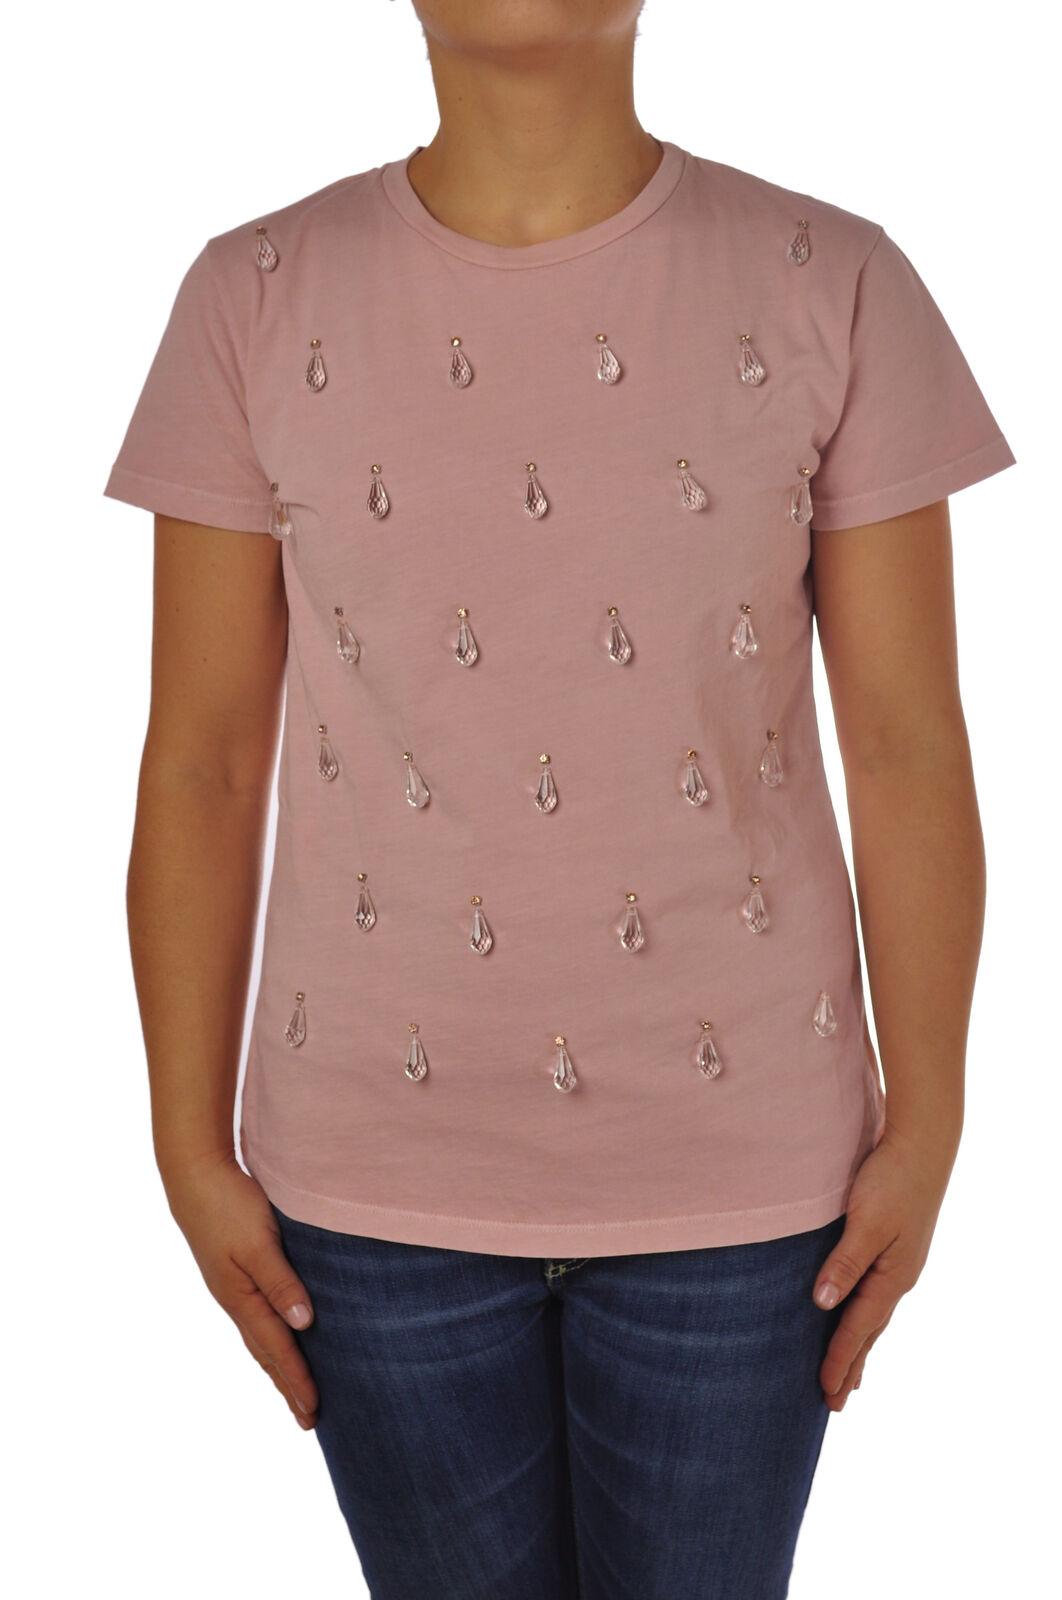 rosao - Topwear-T-shirts - Donna - rosa - 4762010H184850